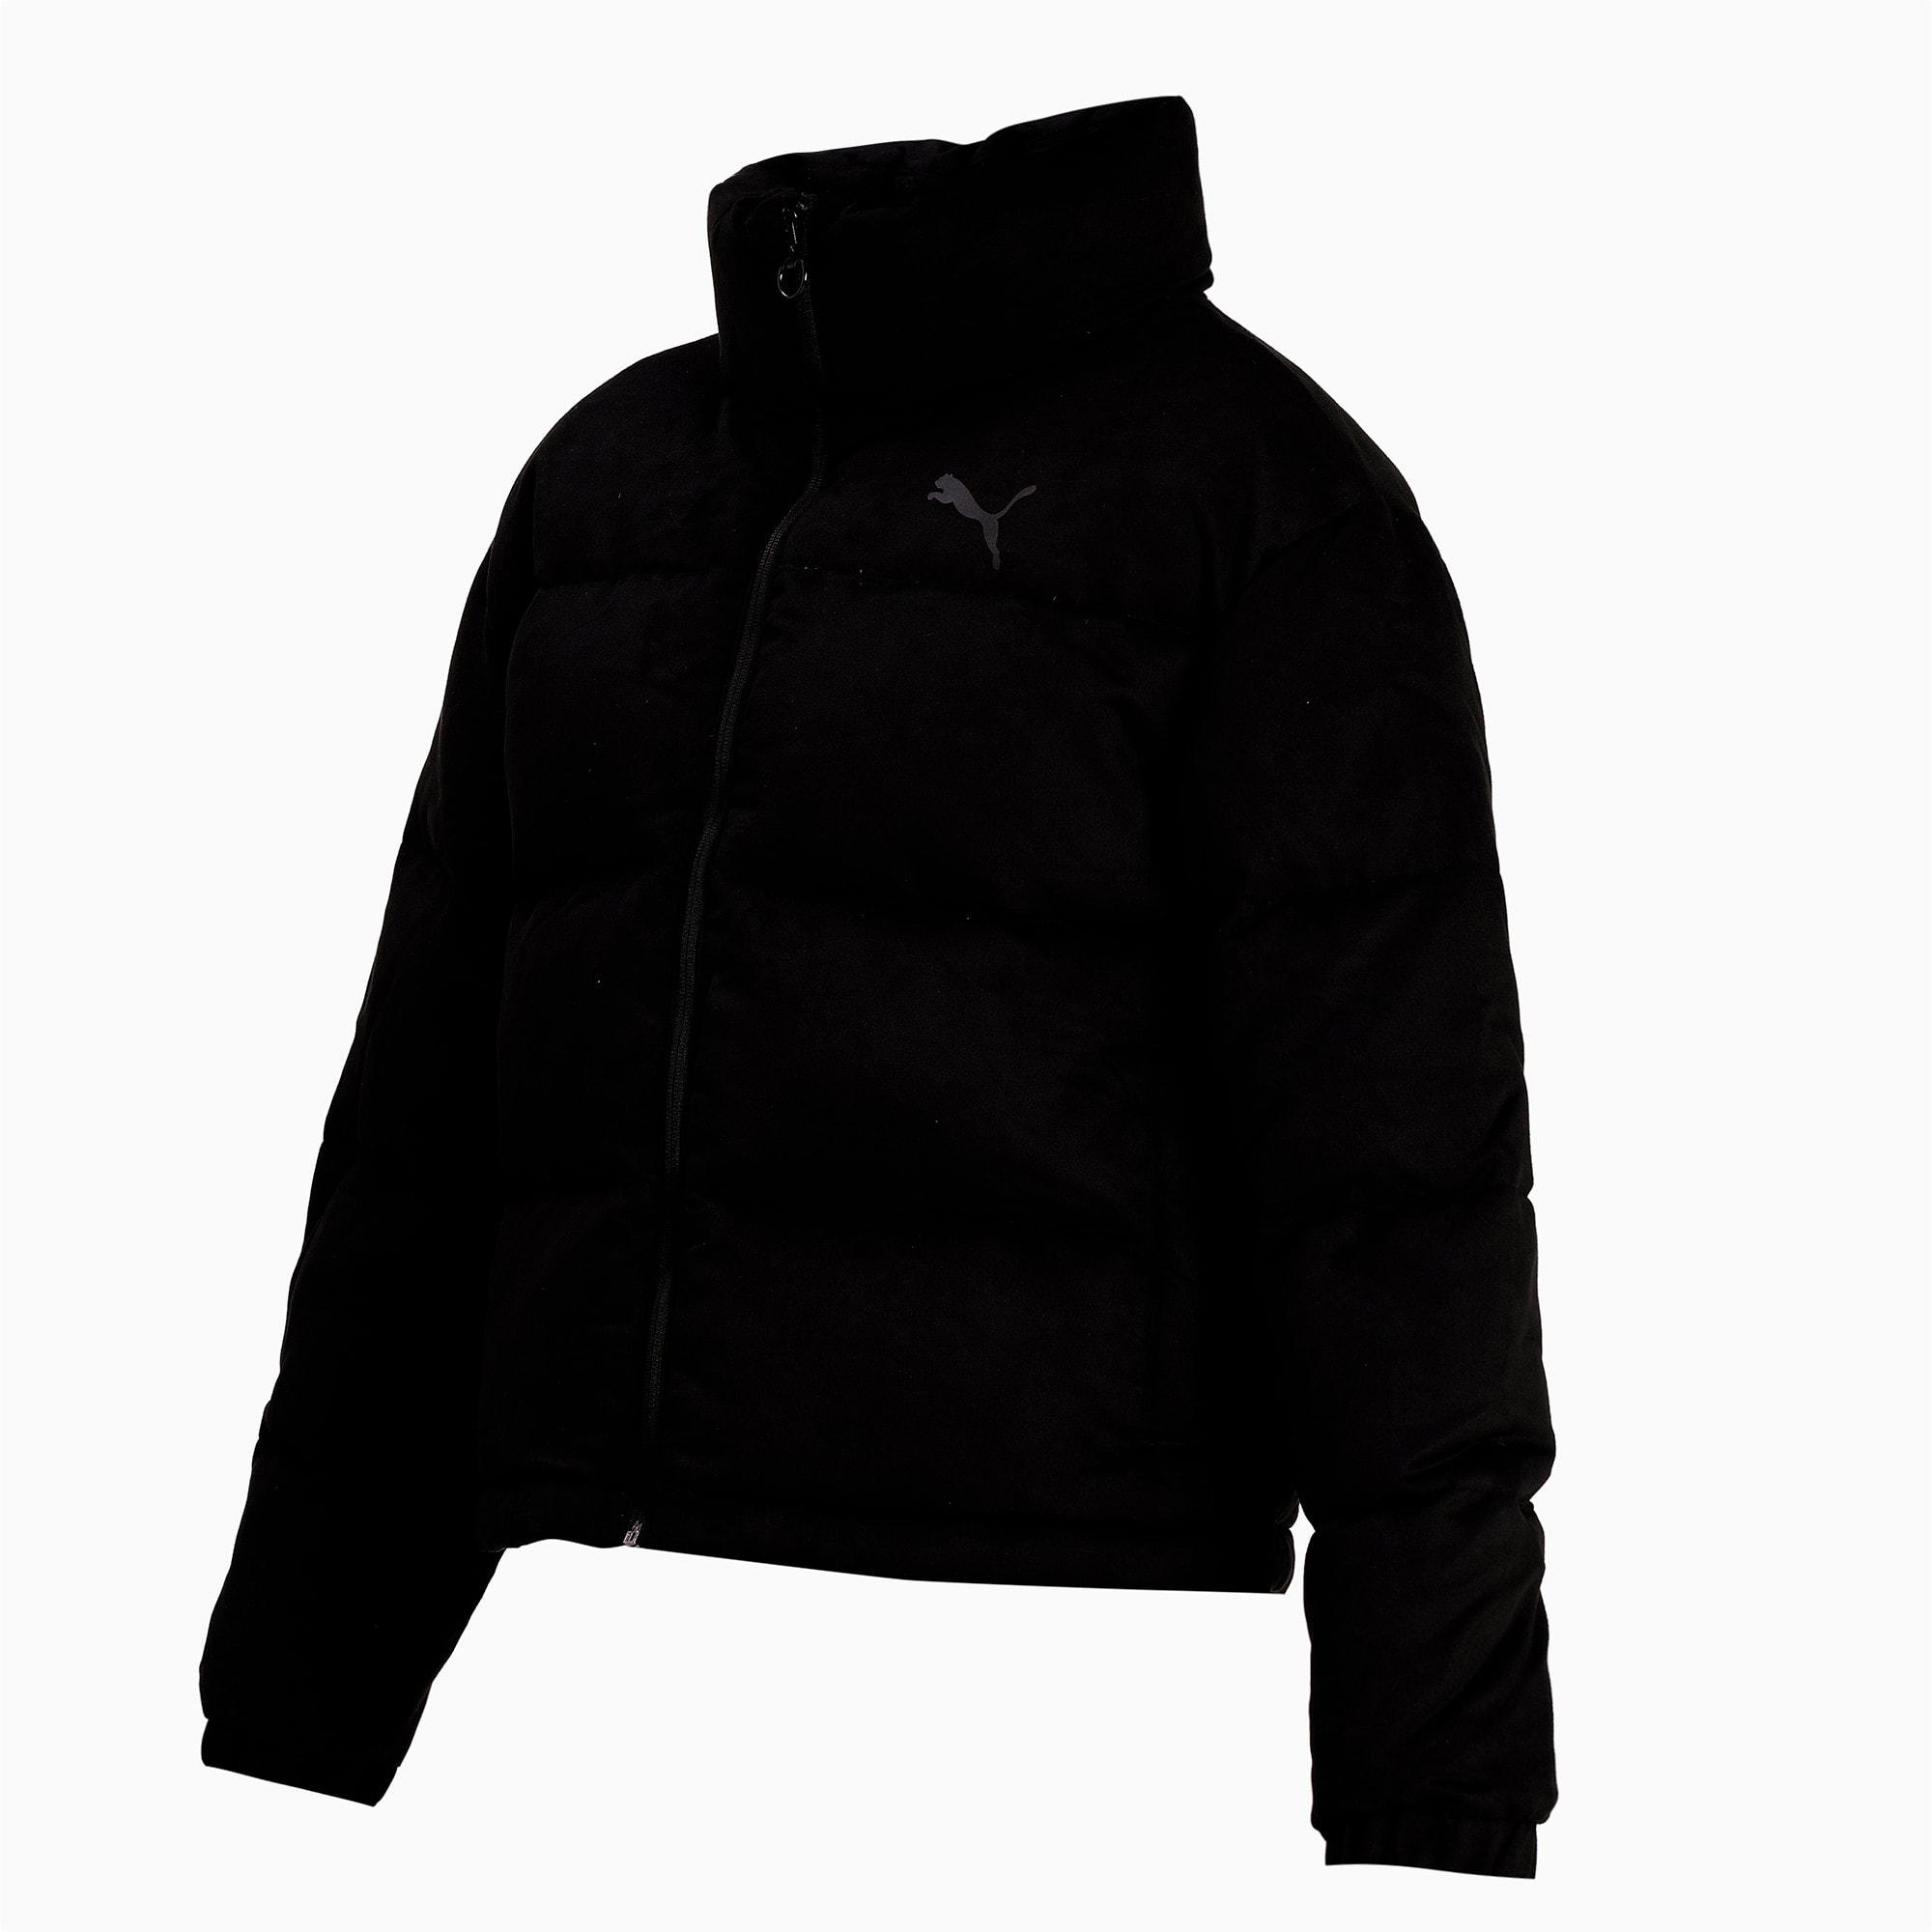 Thumbnail 4 of 480 Style Down Women's Jacket, Puma Black, medium-IND